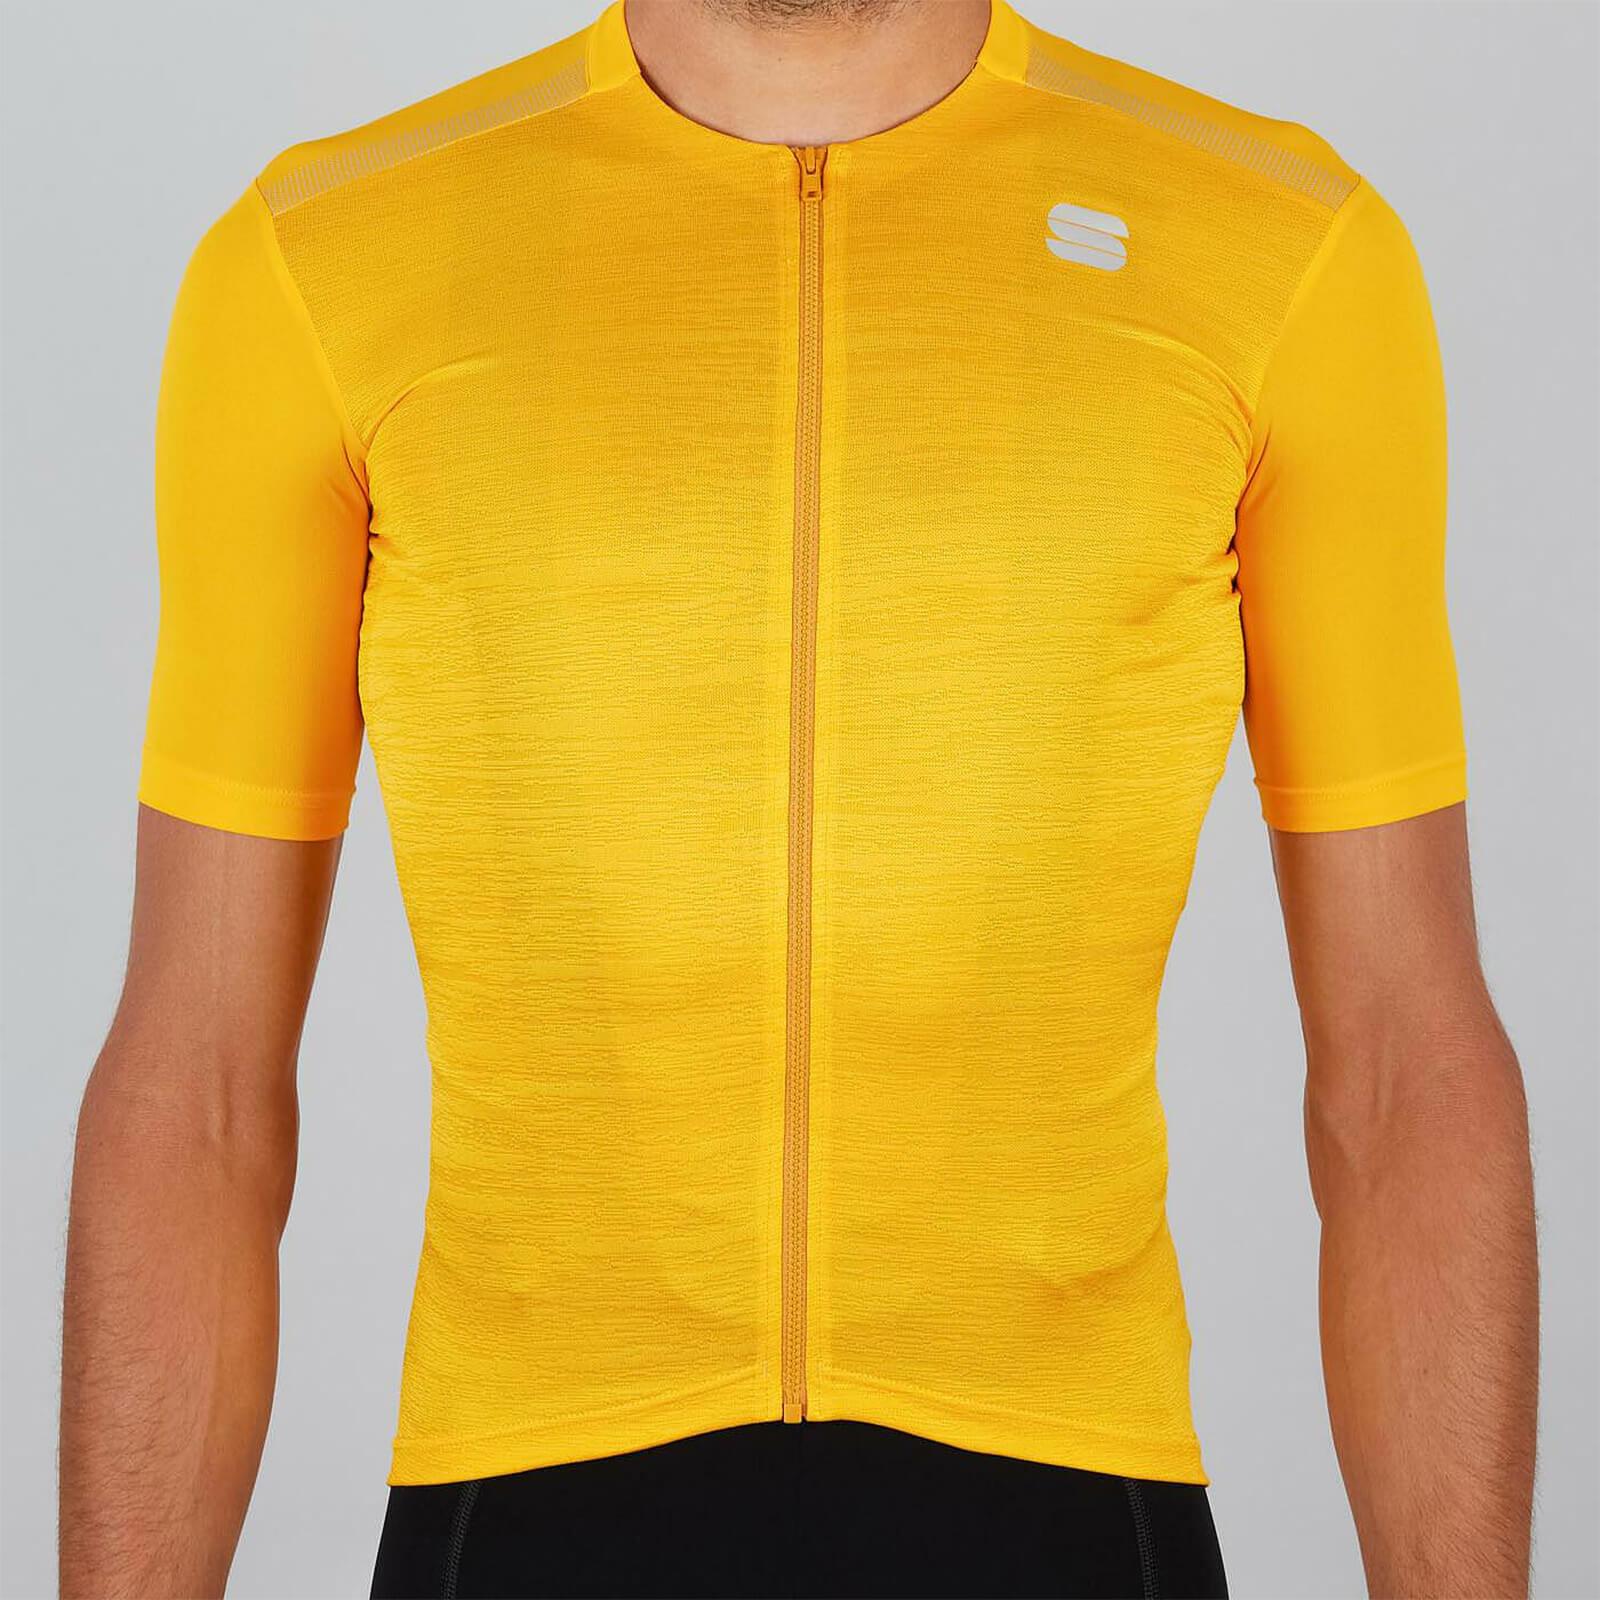 Sportful Supergiara Jersey - M - Yellow